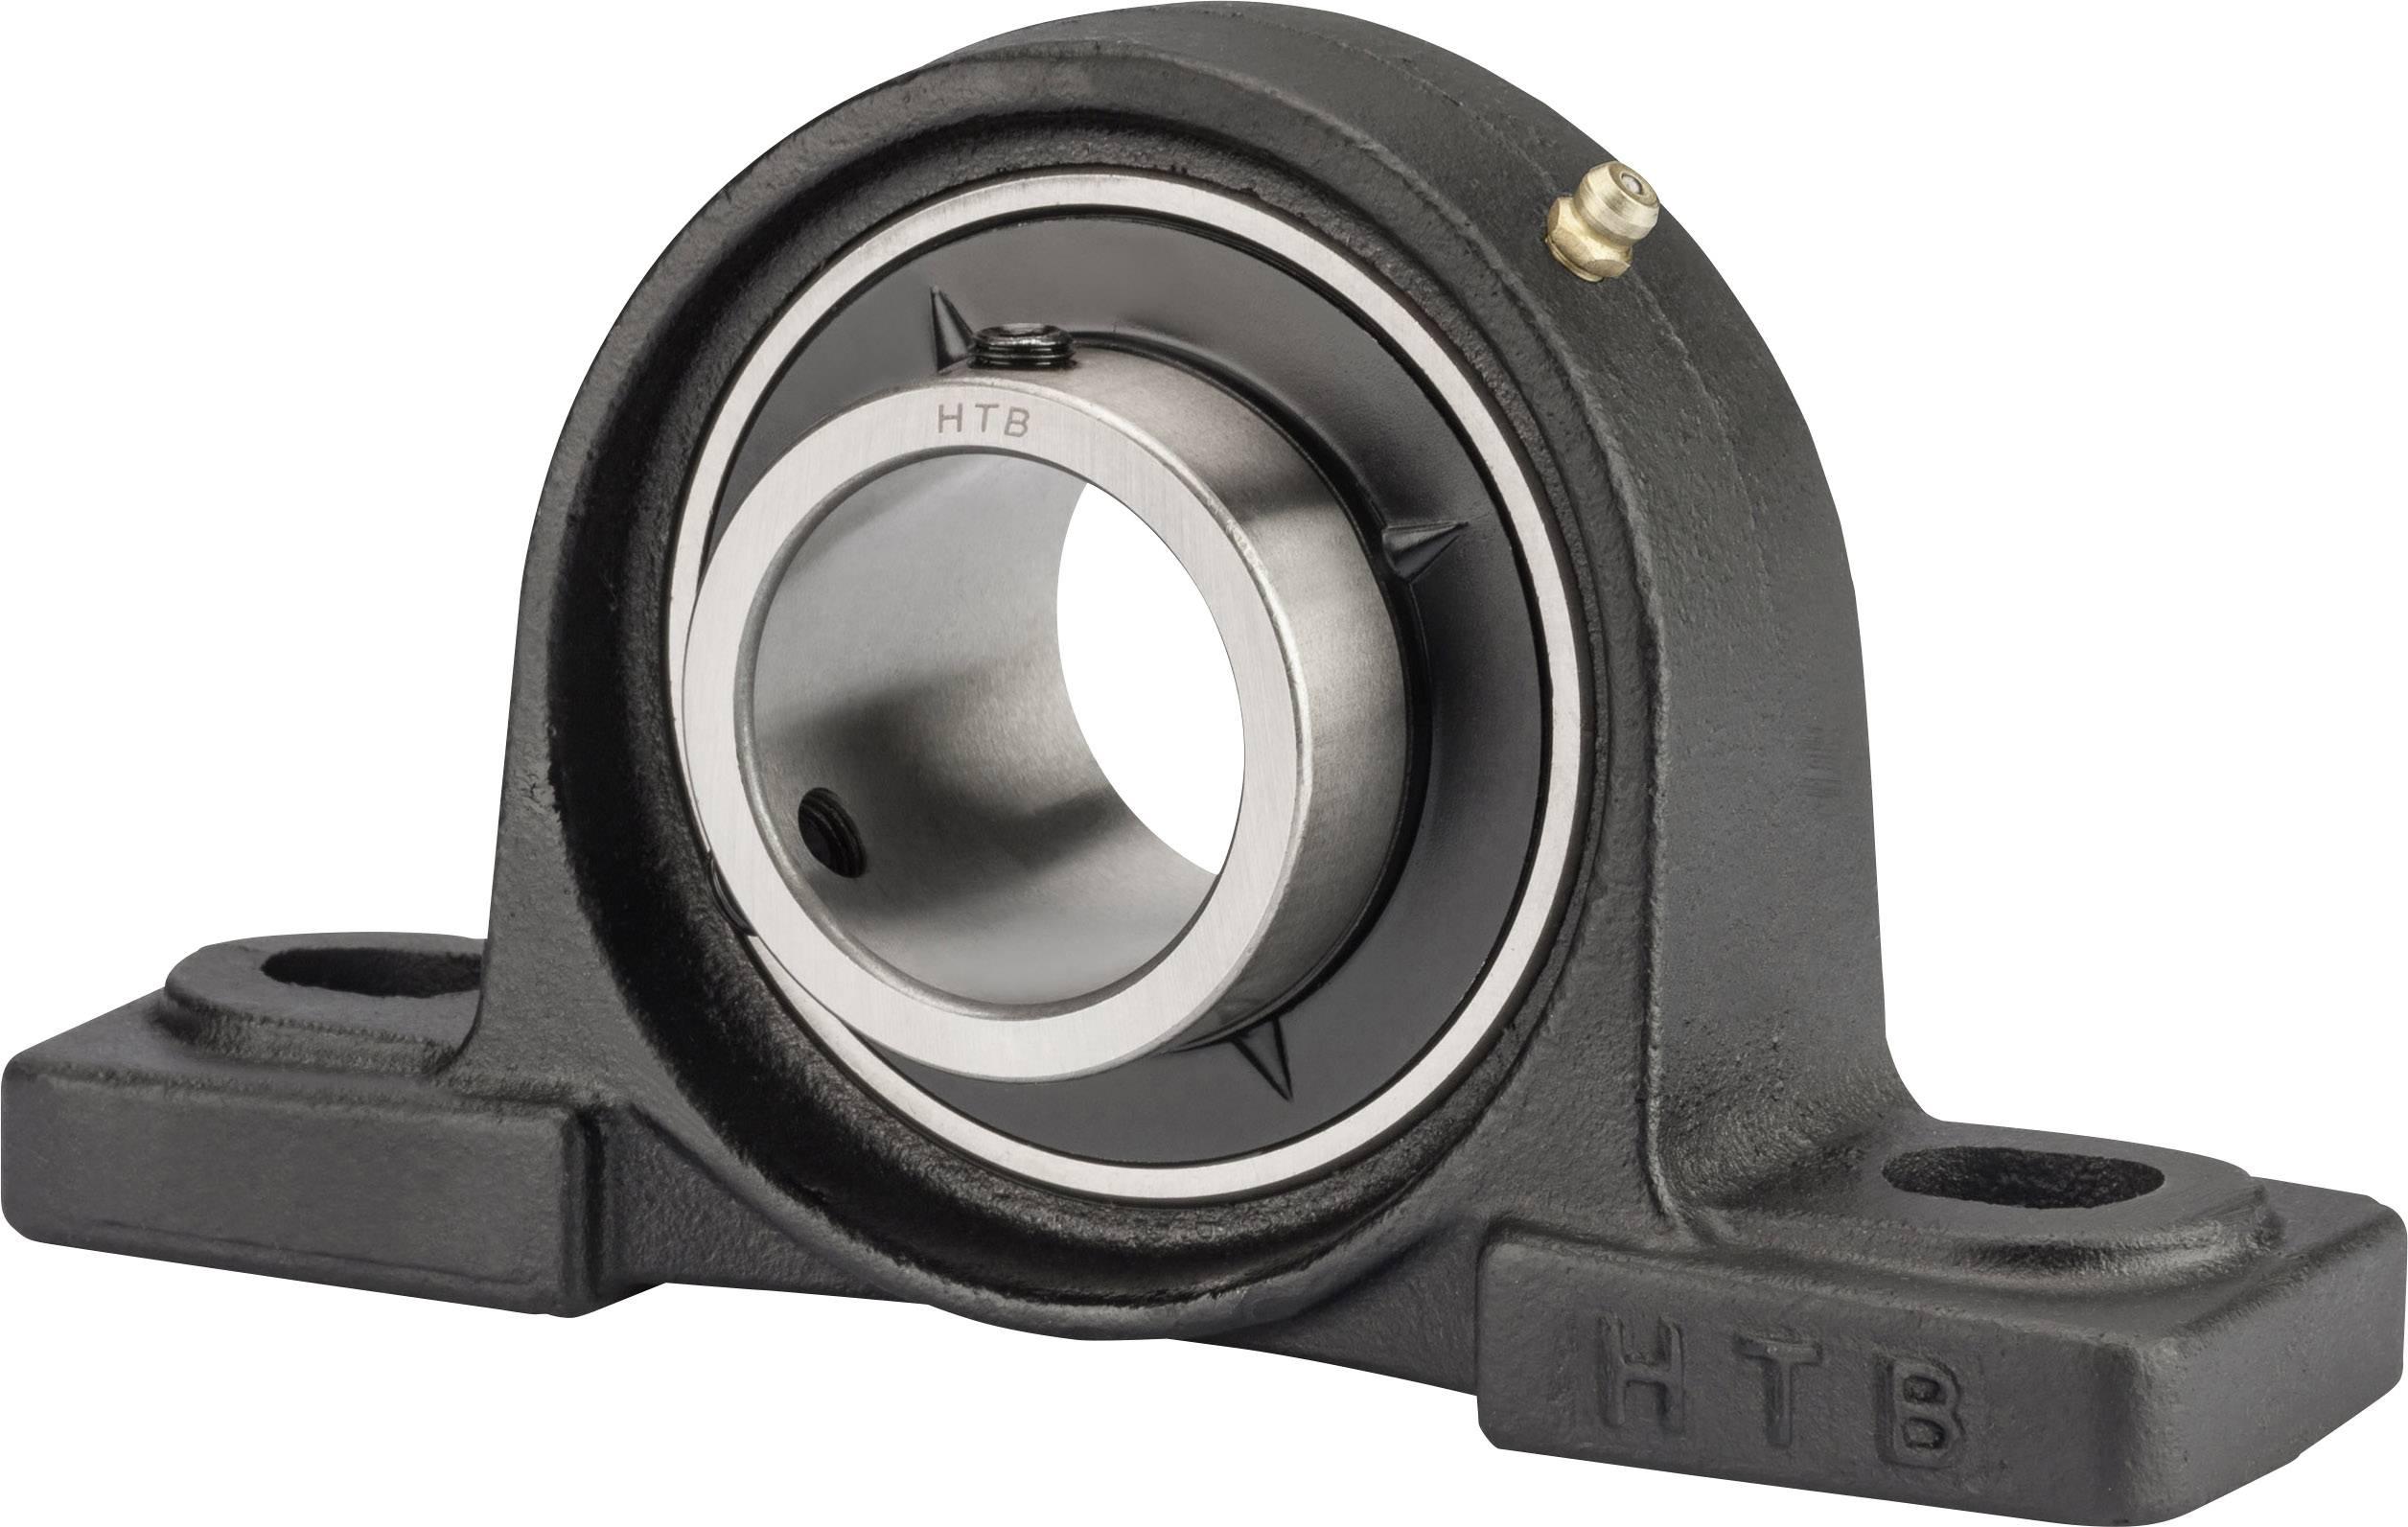 htb ucp 205 plummer block grey iron bore diameter 25 mm hole spacing 105 mm